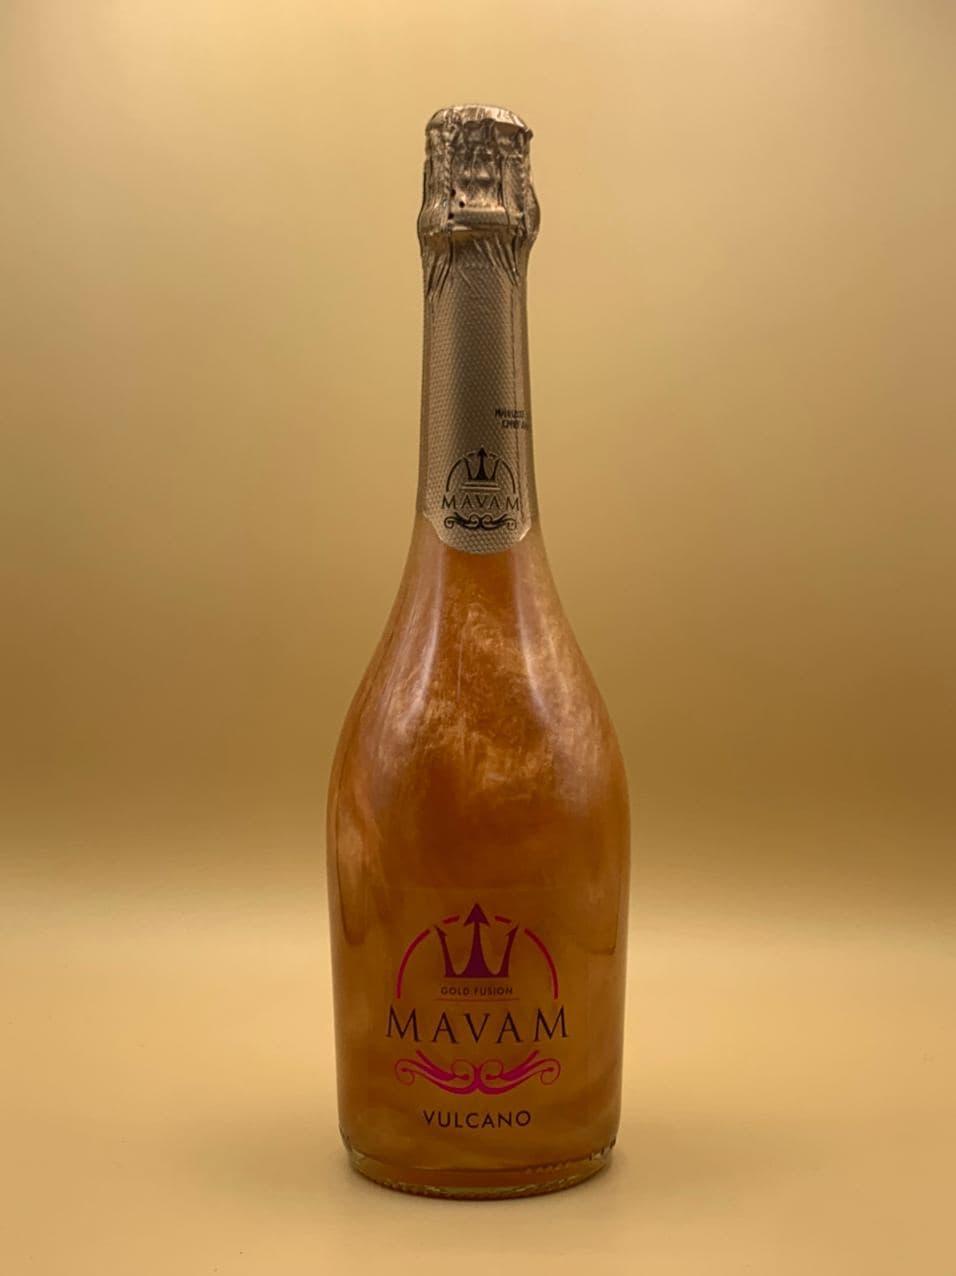 Игристое вино Mavam Vulcano 0.75L Мавам Вулкано 0.7л